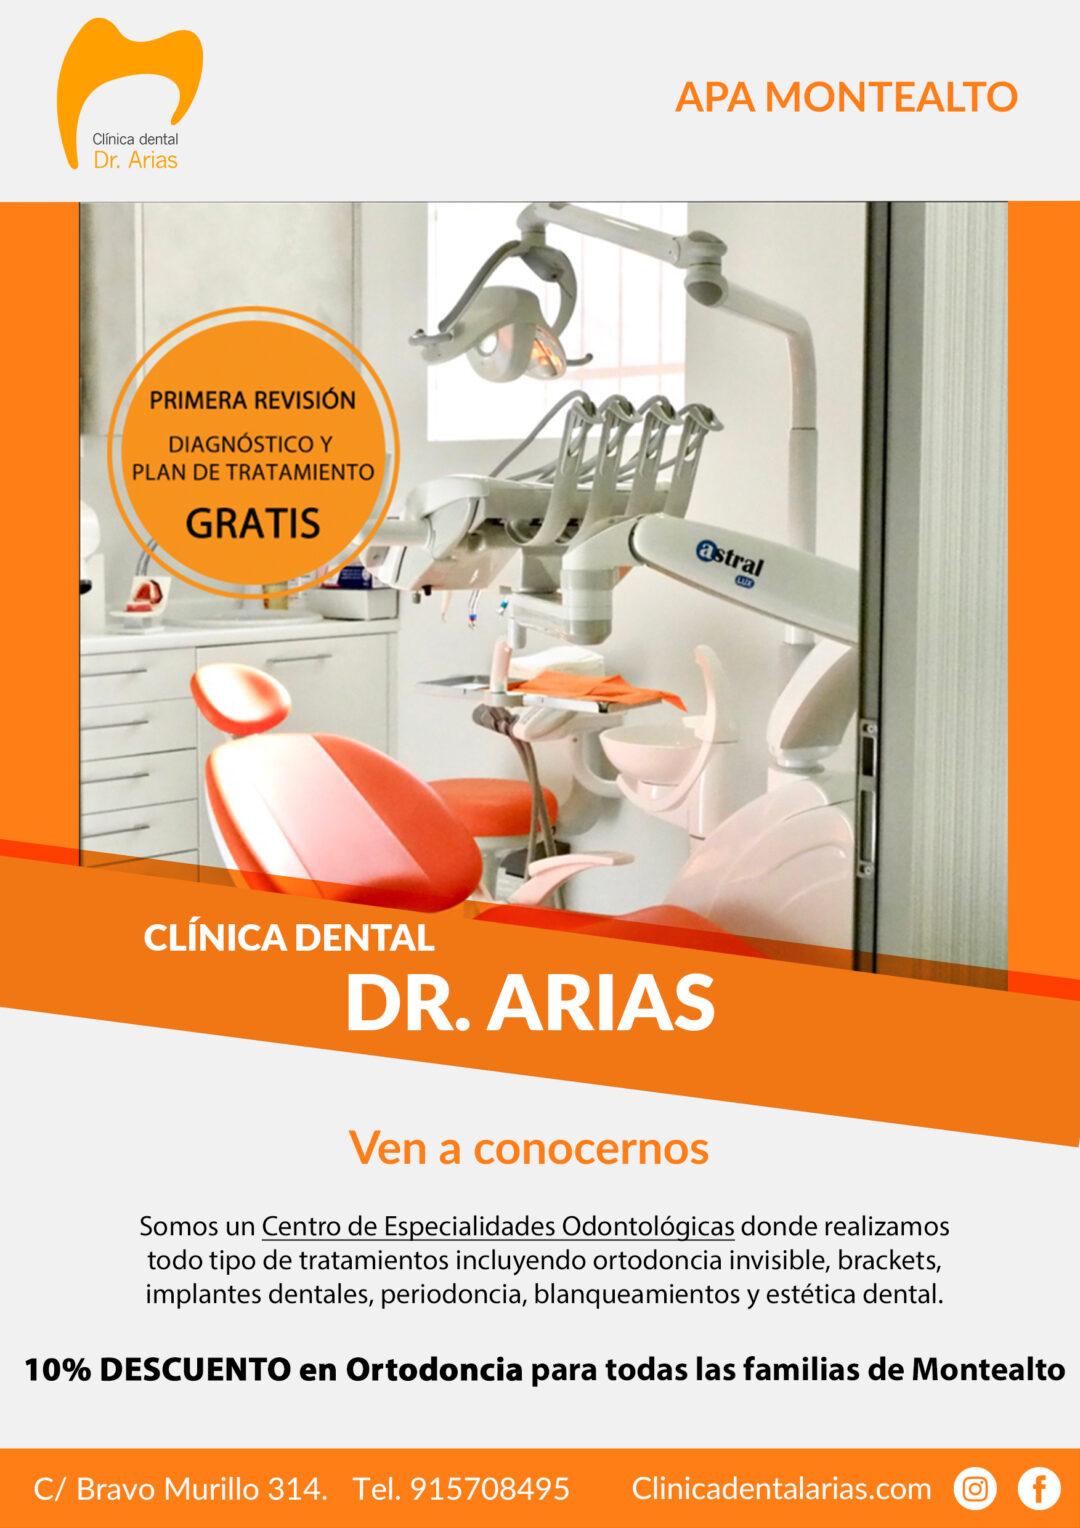 Clínica dental Dr. Arias